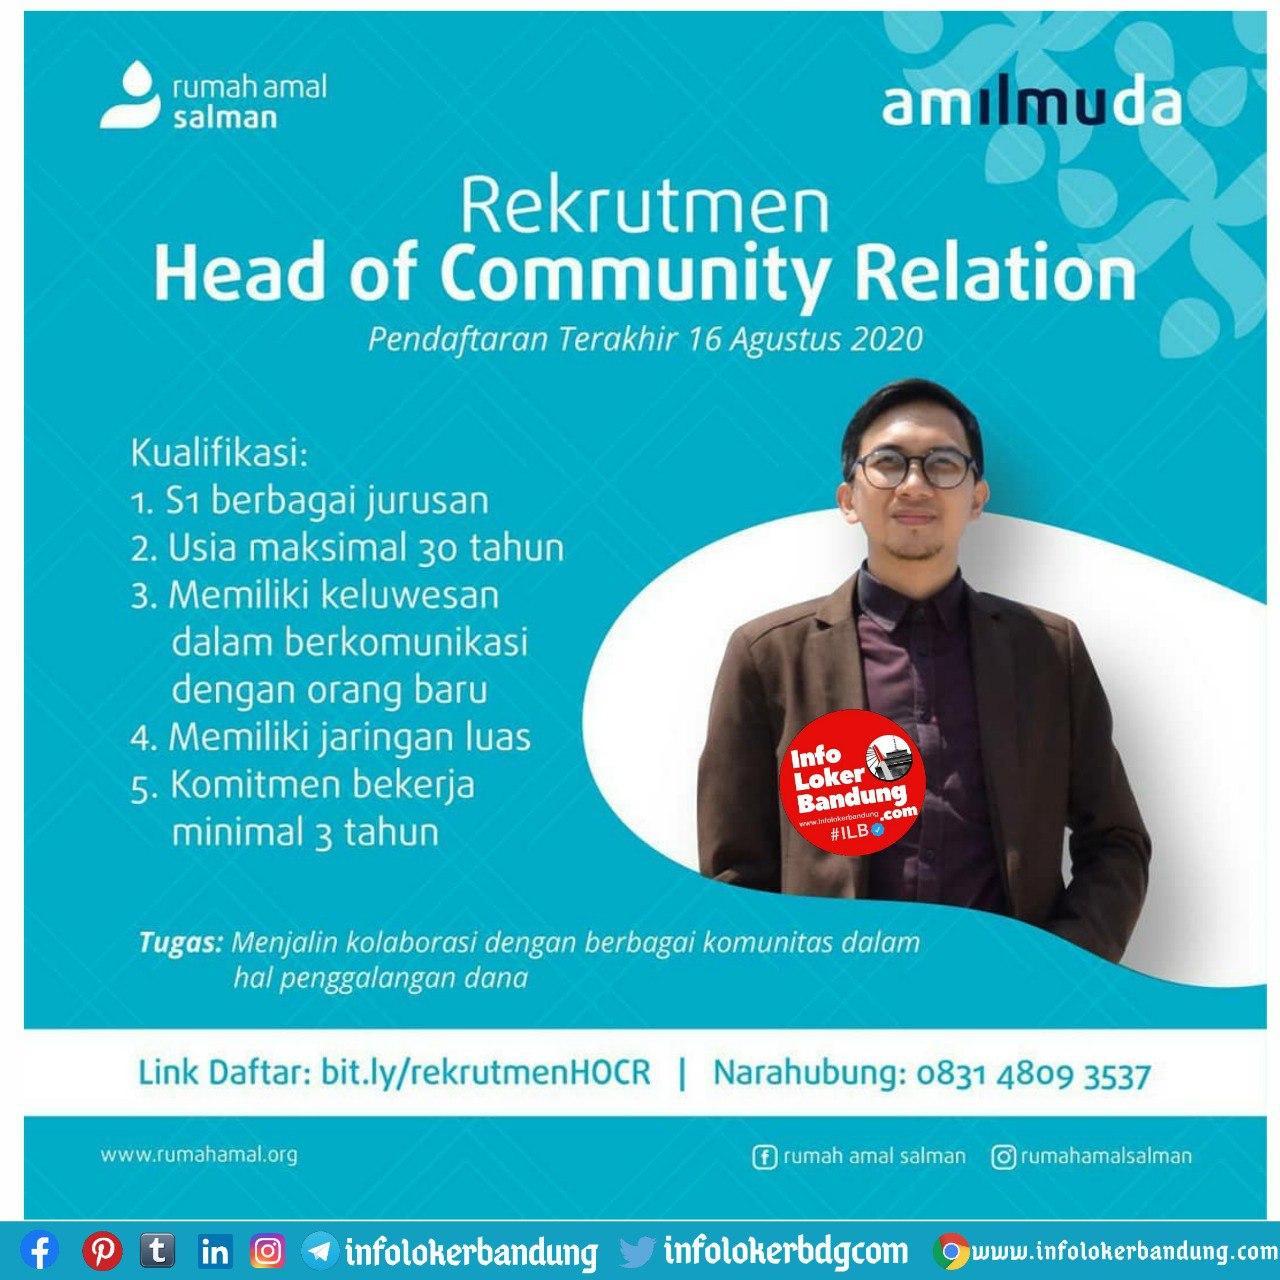 Lowongan Kerja Rumah Amal Salman Bandung Agustus 2020